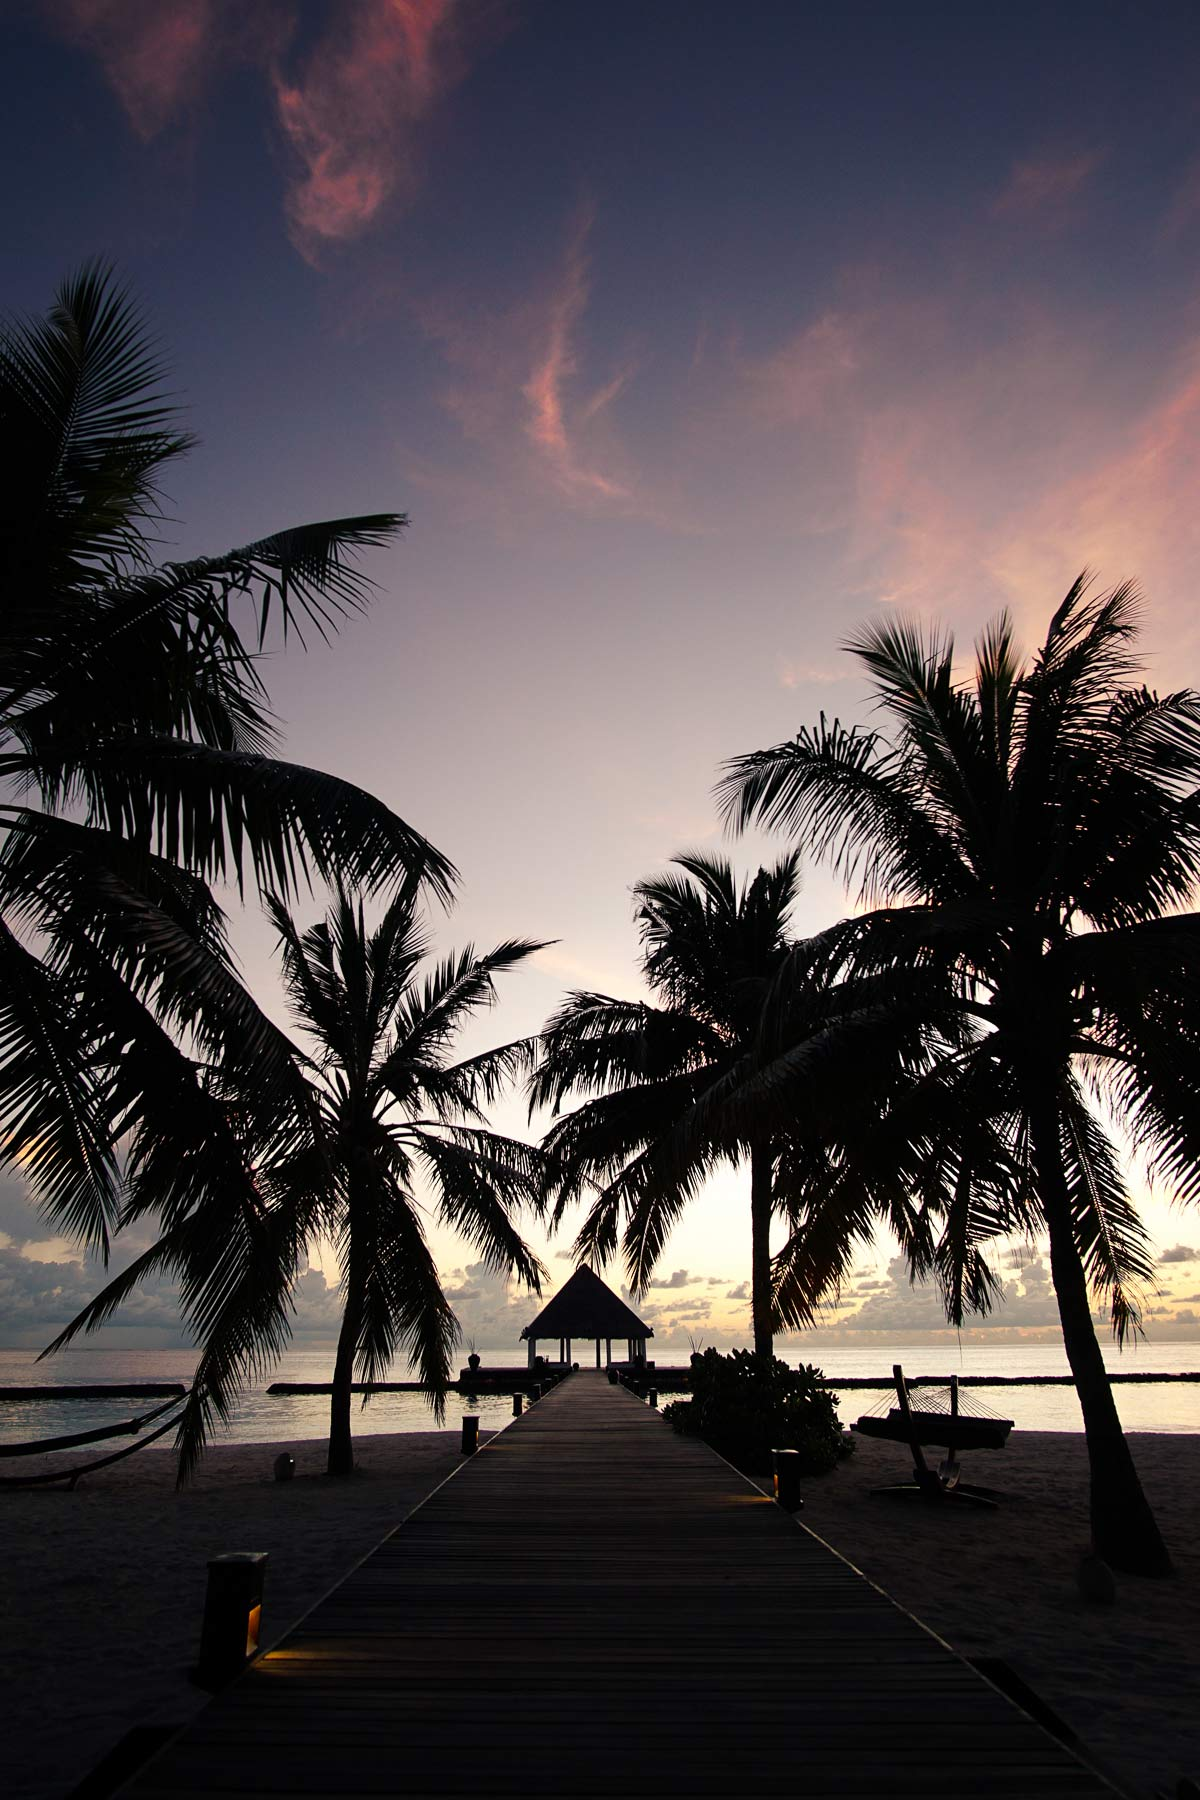 Sonnenuntergang Coco Bodu Hithi